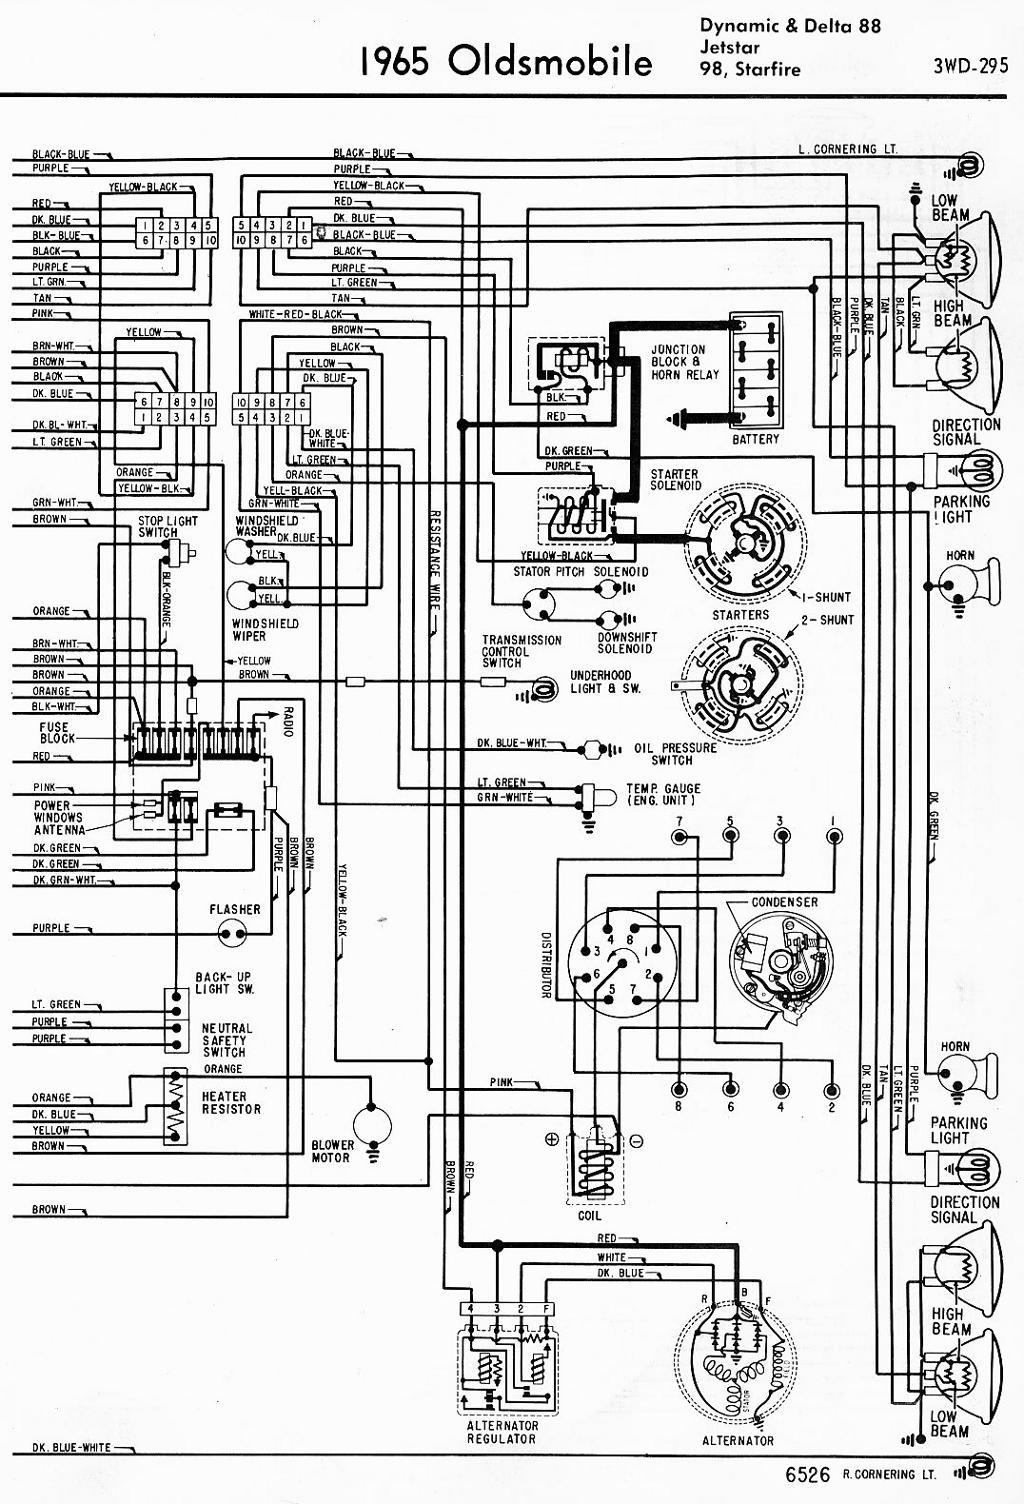 medium resolution of 2001 oldsmobile silhouette fuse diagram 2007 pontiac grand prix source 2001 oldsmobile silhouette wiring diagram